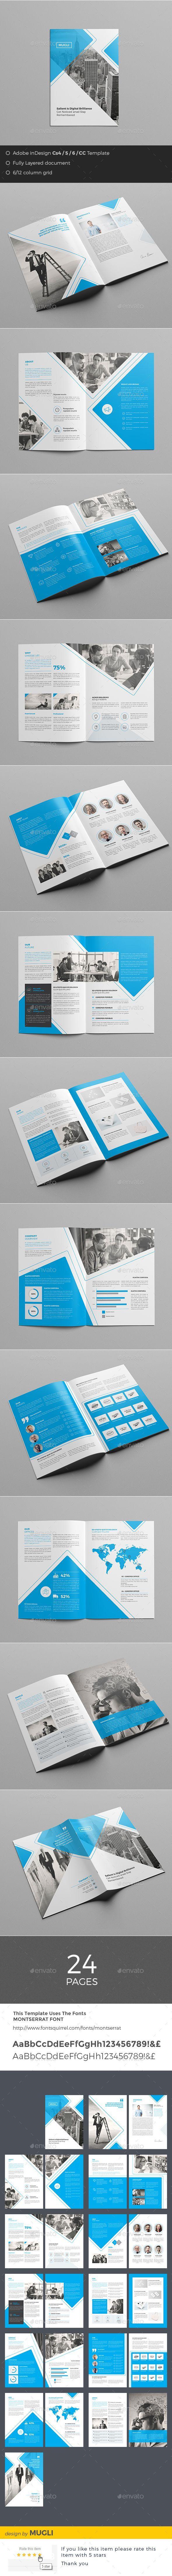 best business letter template ideas pinterest brochure | Home Design ...